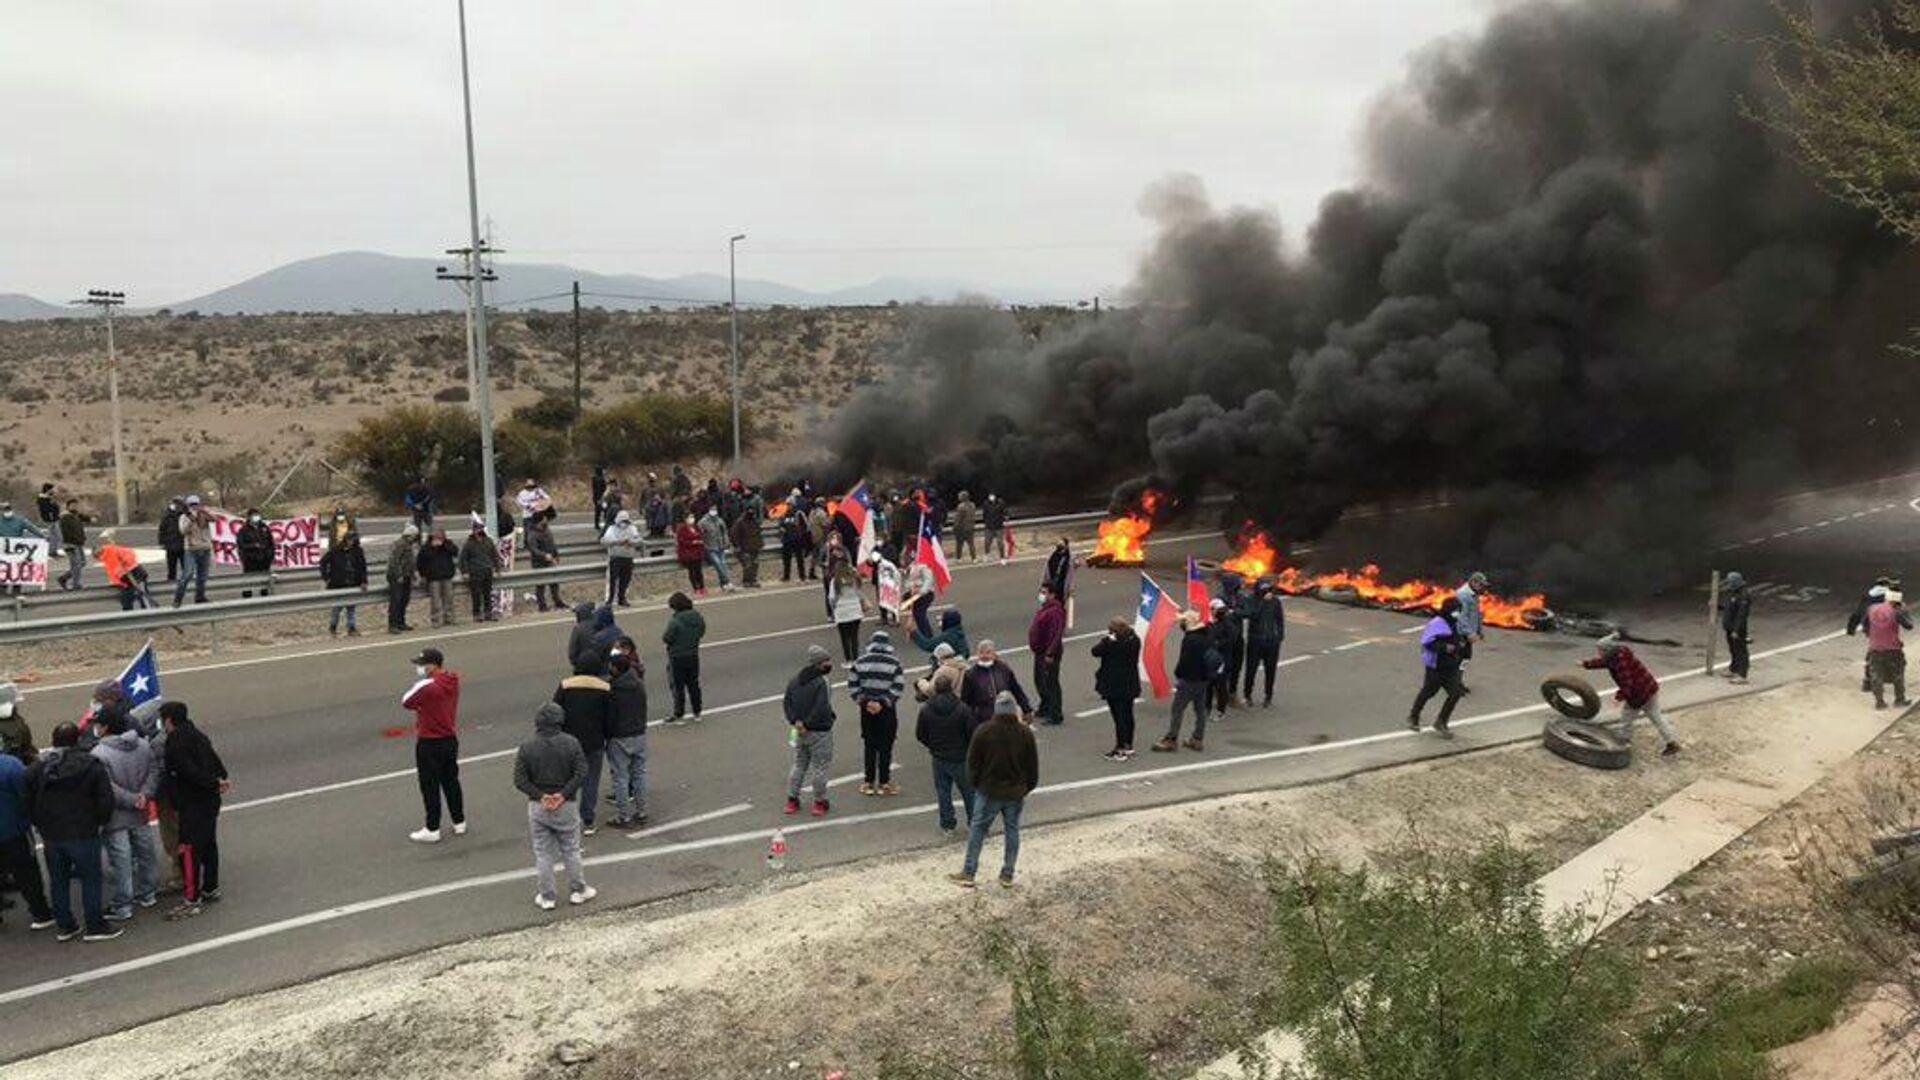 Pescadores chilenos protestan exigiendo ayudas gubernamentales para enfrentar la pandemia - Sputnik Mundo, 1920, 03.08.2021